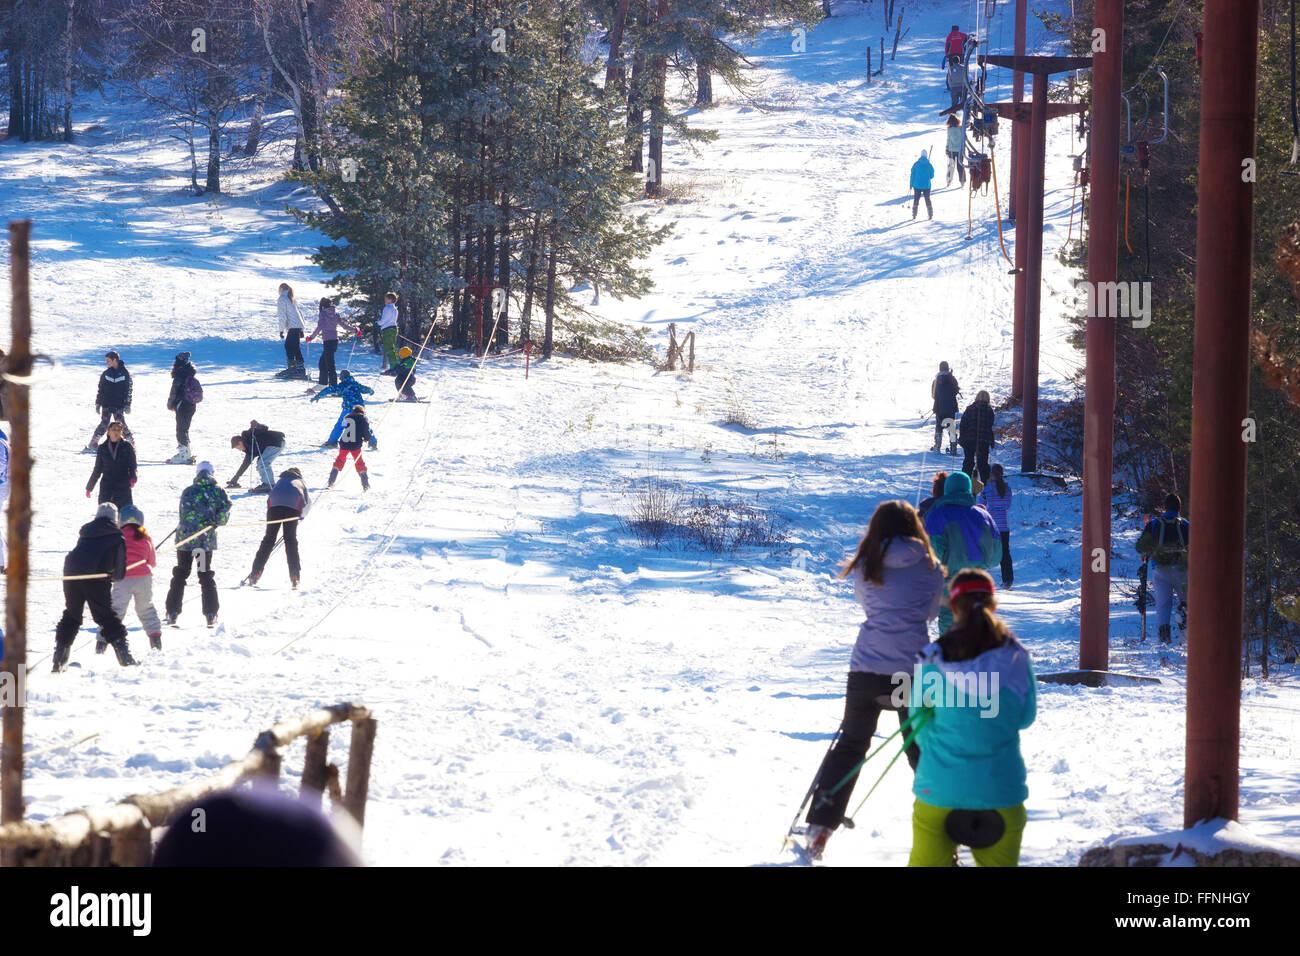 Season of winter sports - Stock Image